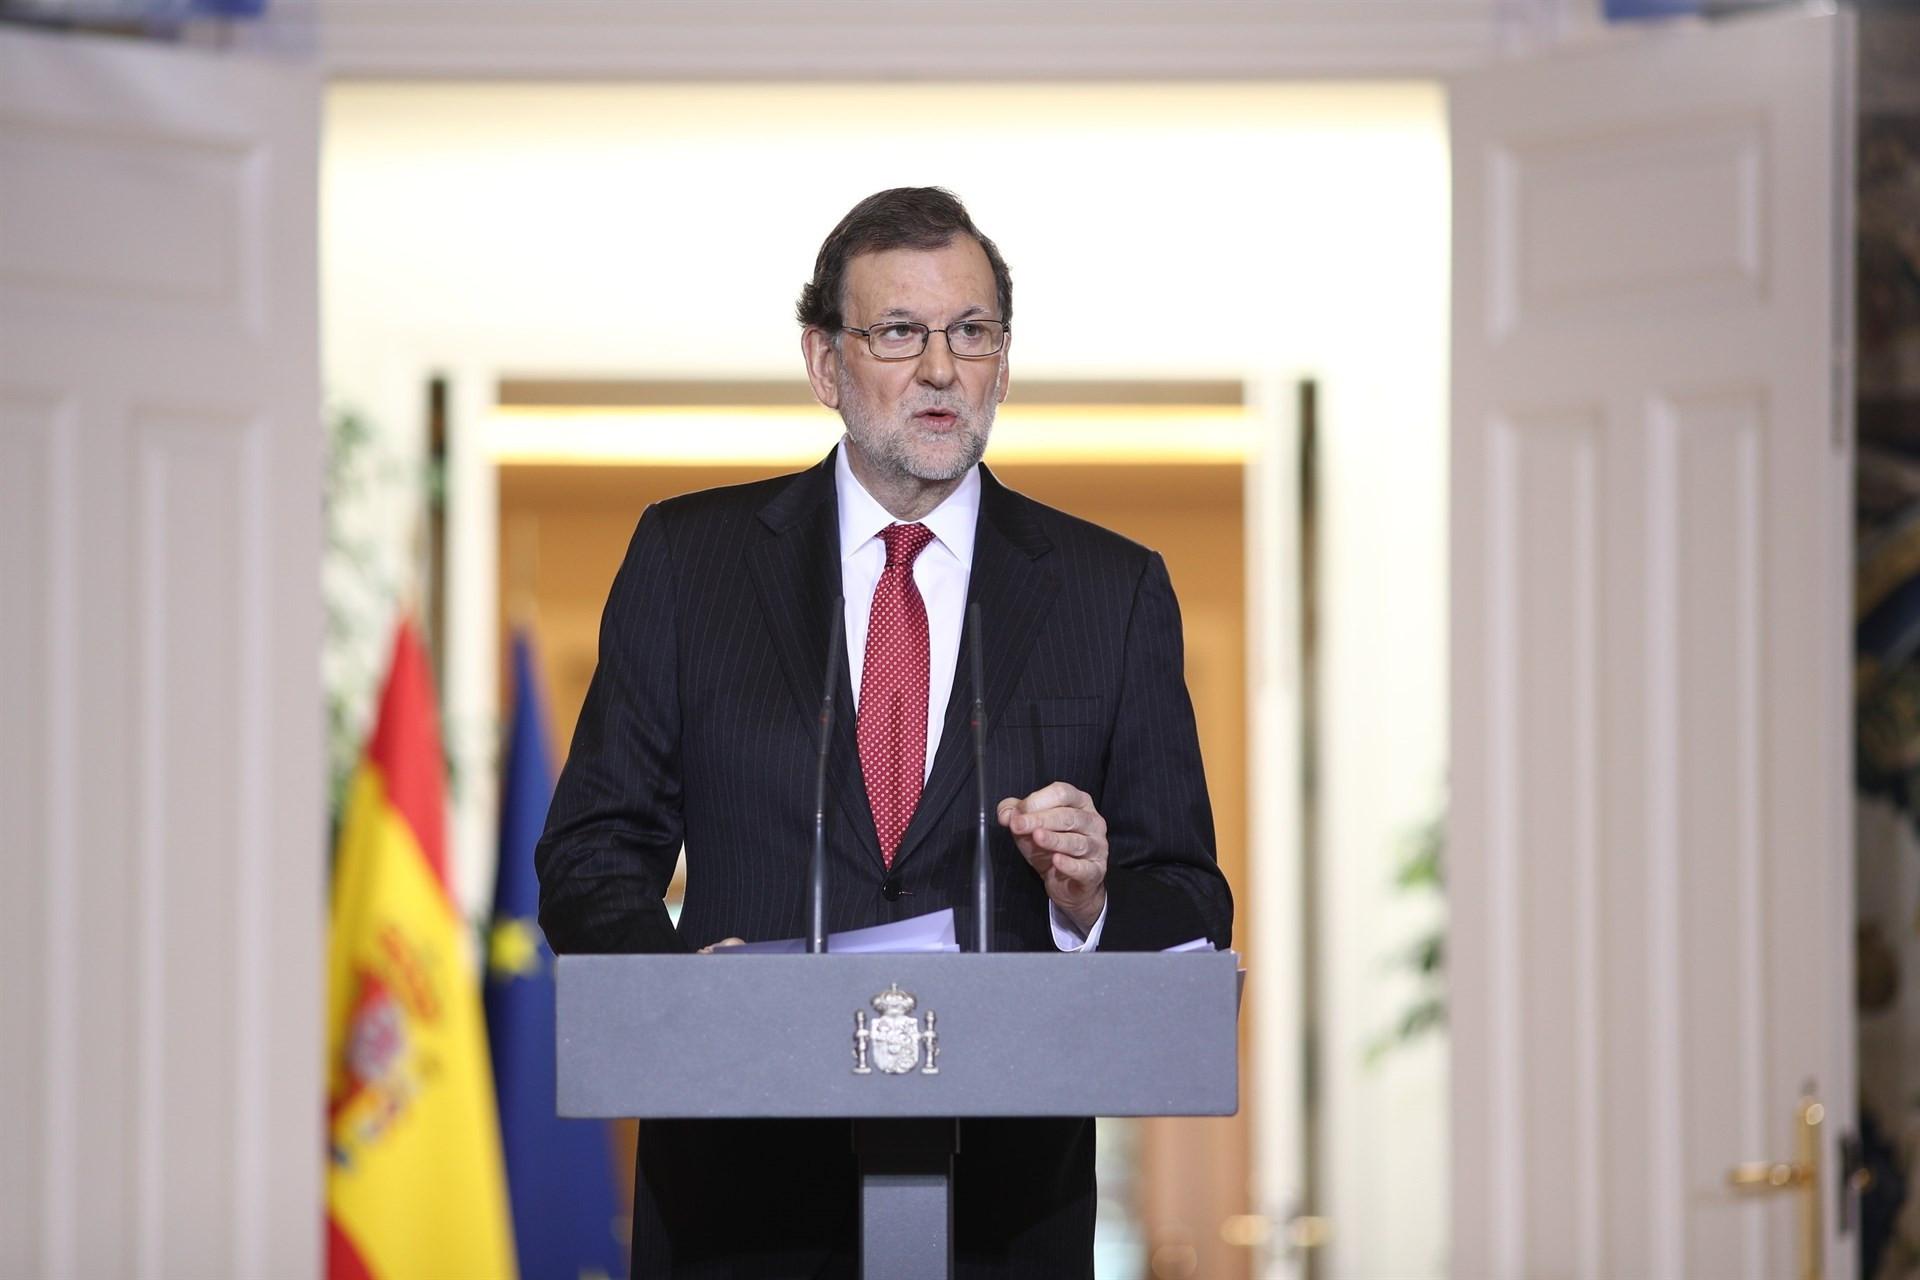 Rajoybalance2016